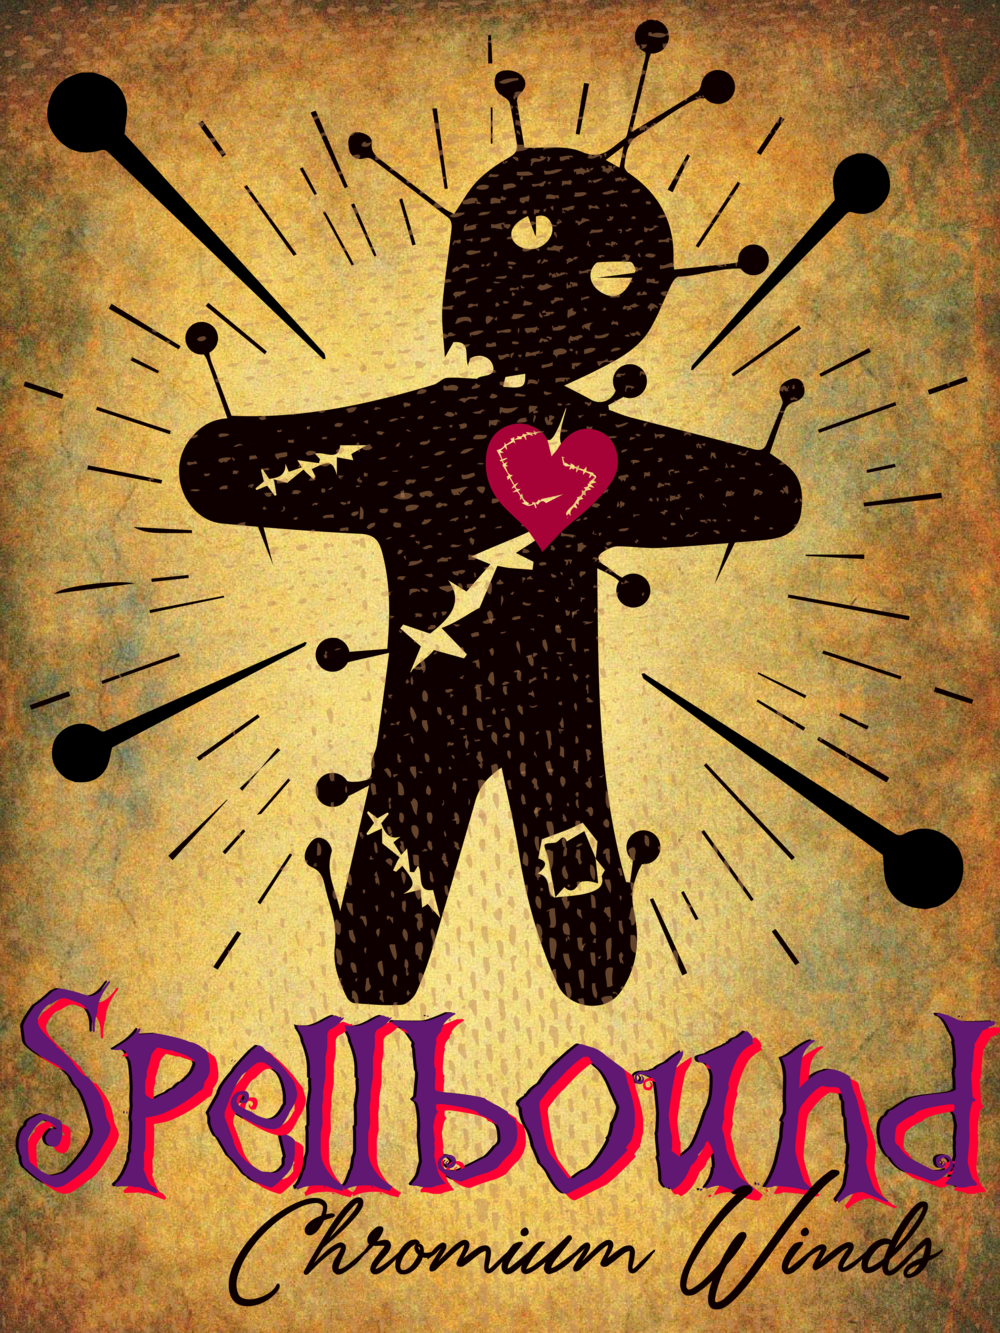 Spellbound-01.png